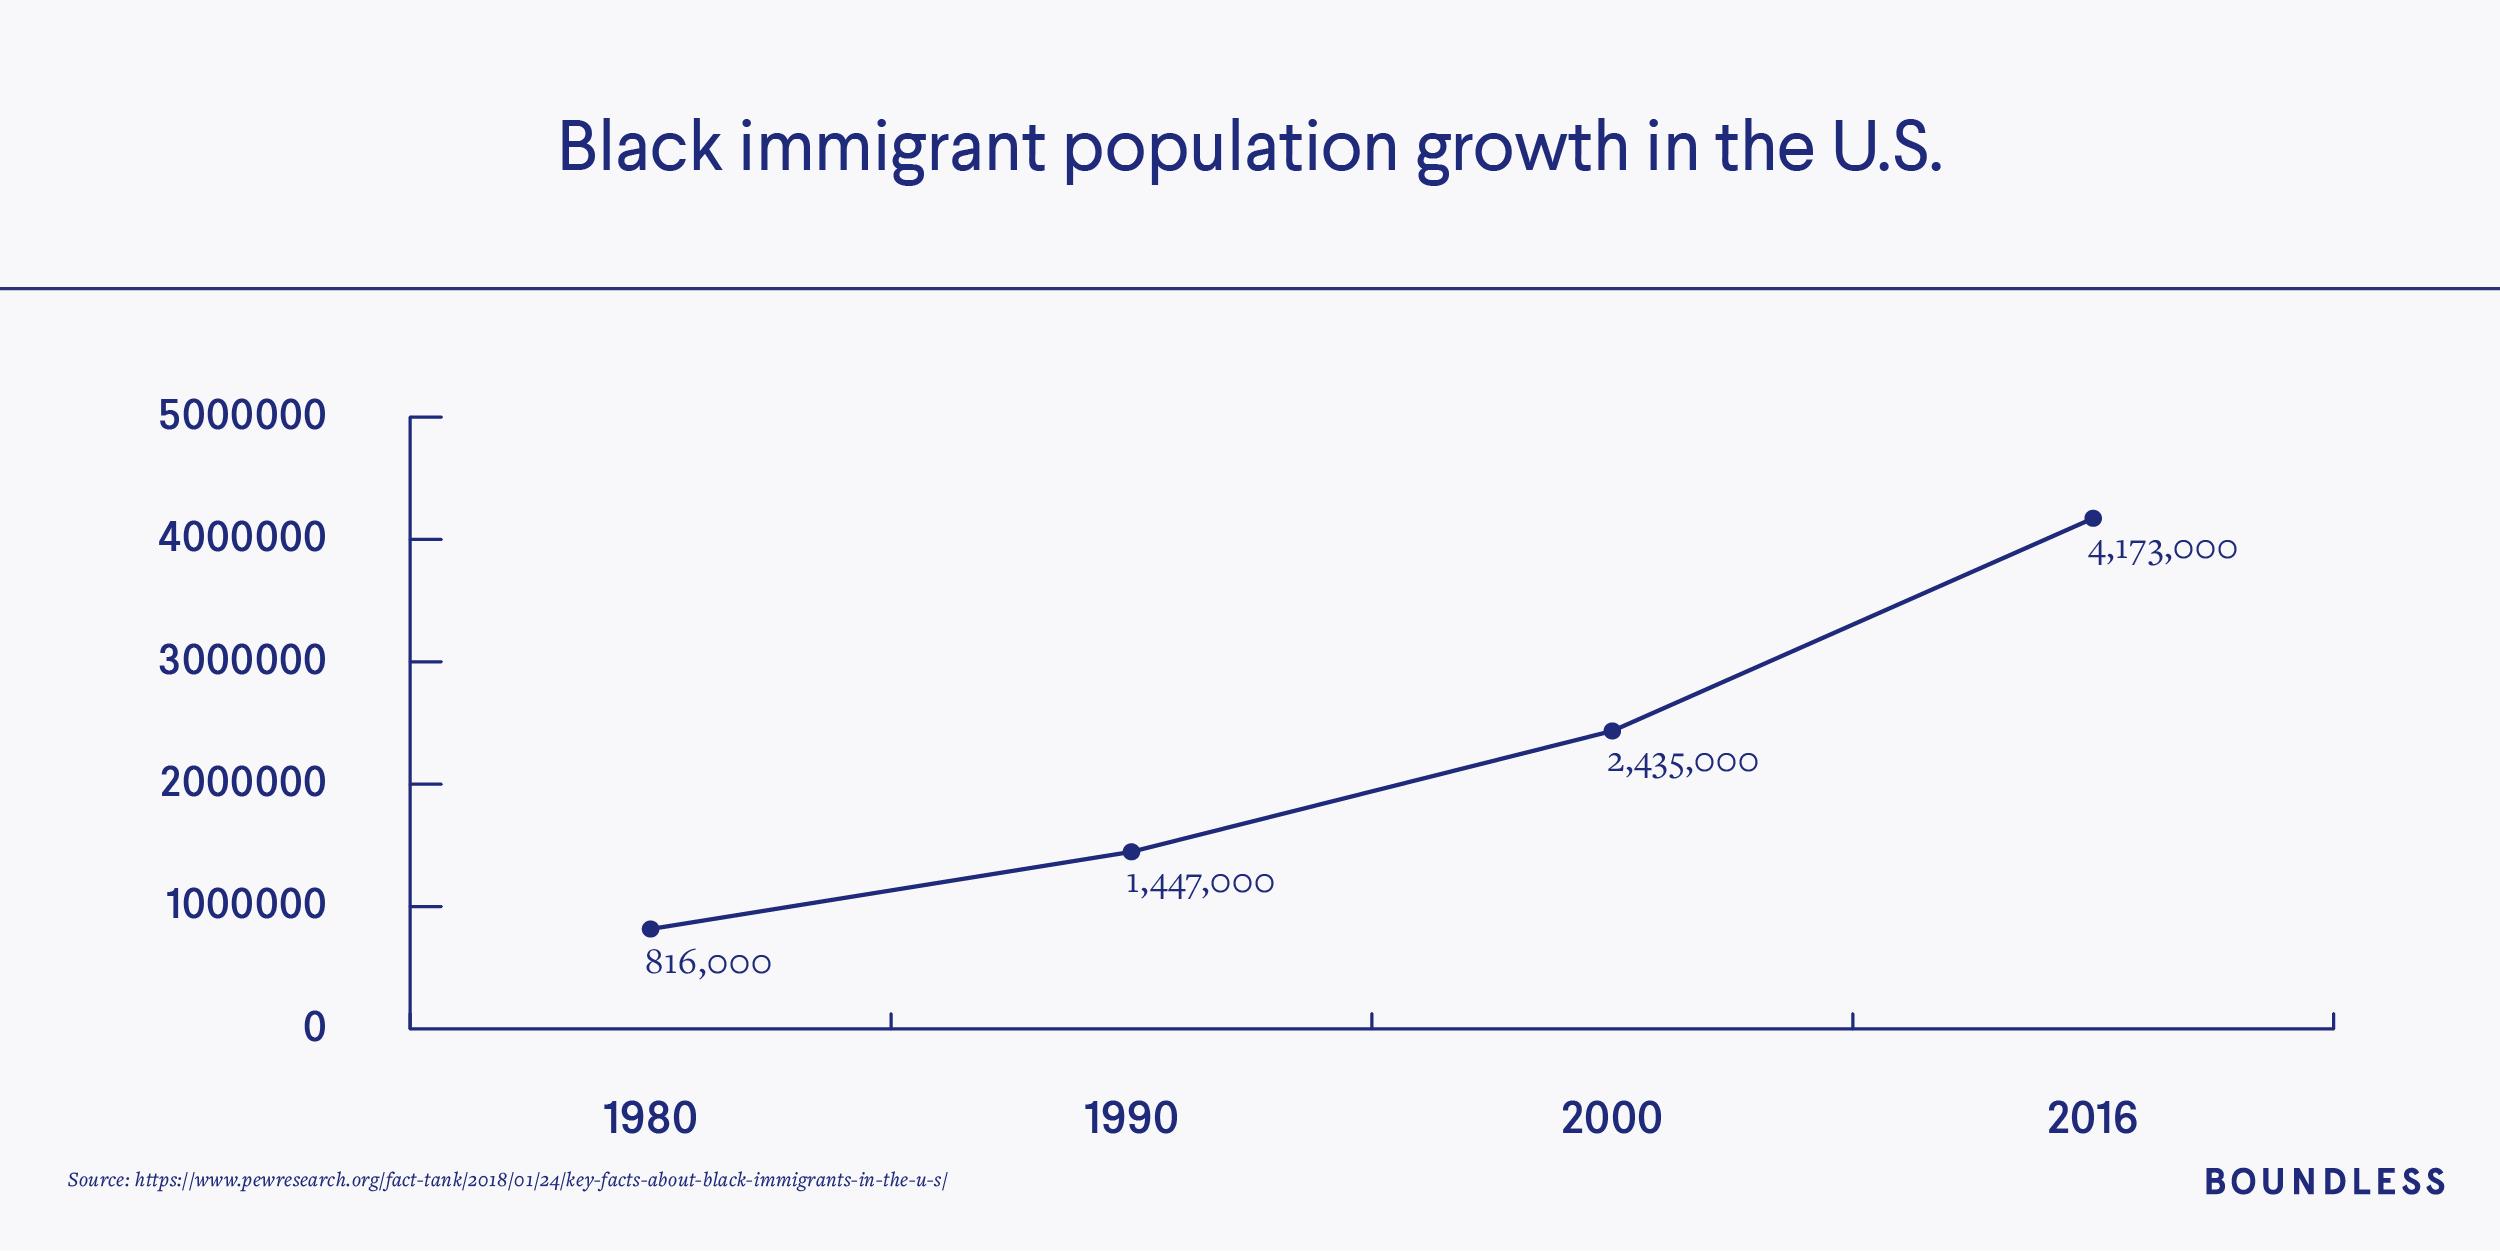 Black immigrant population growth